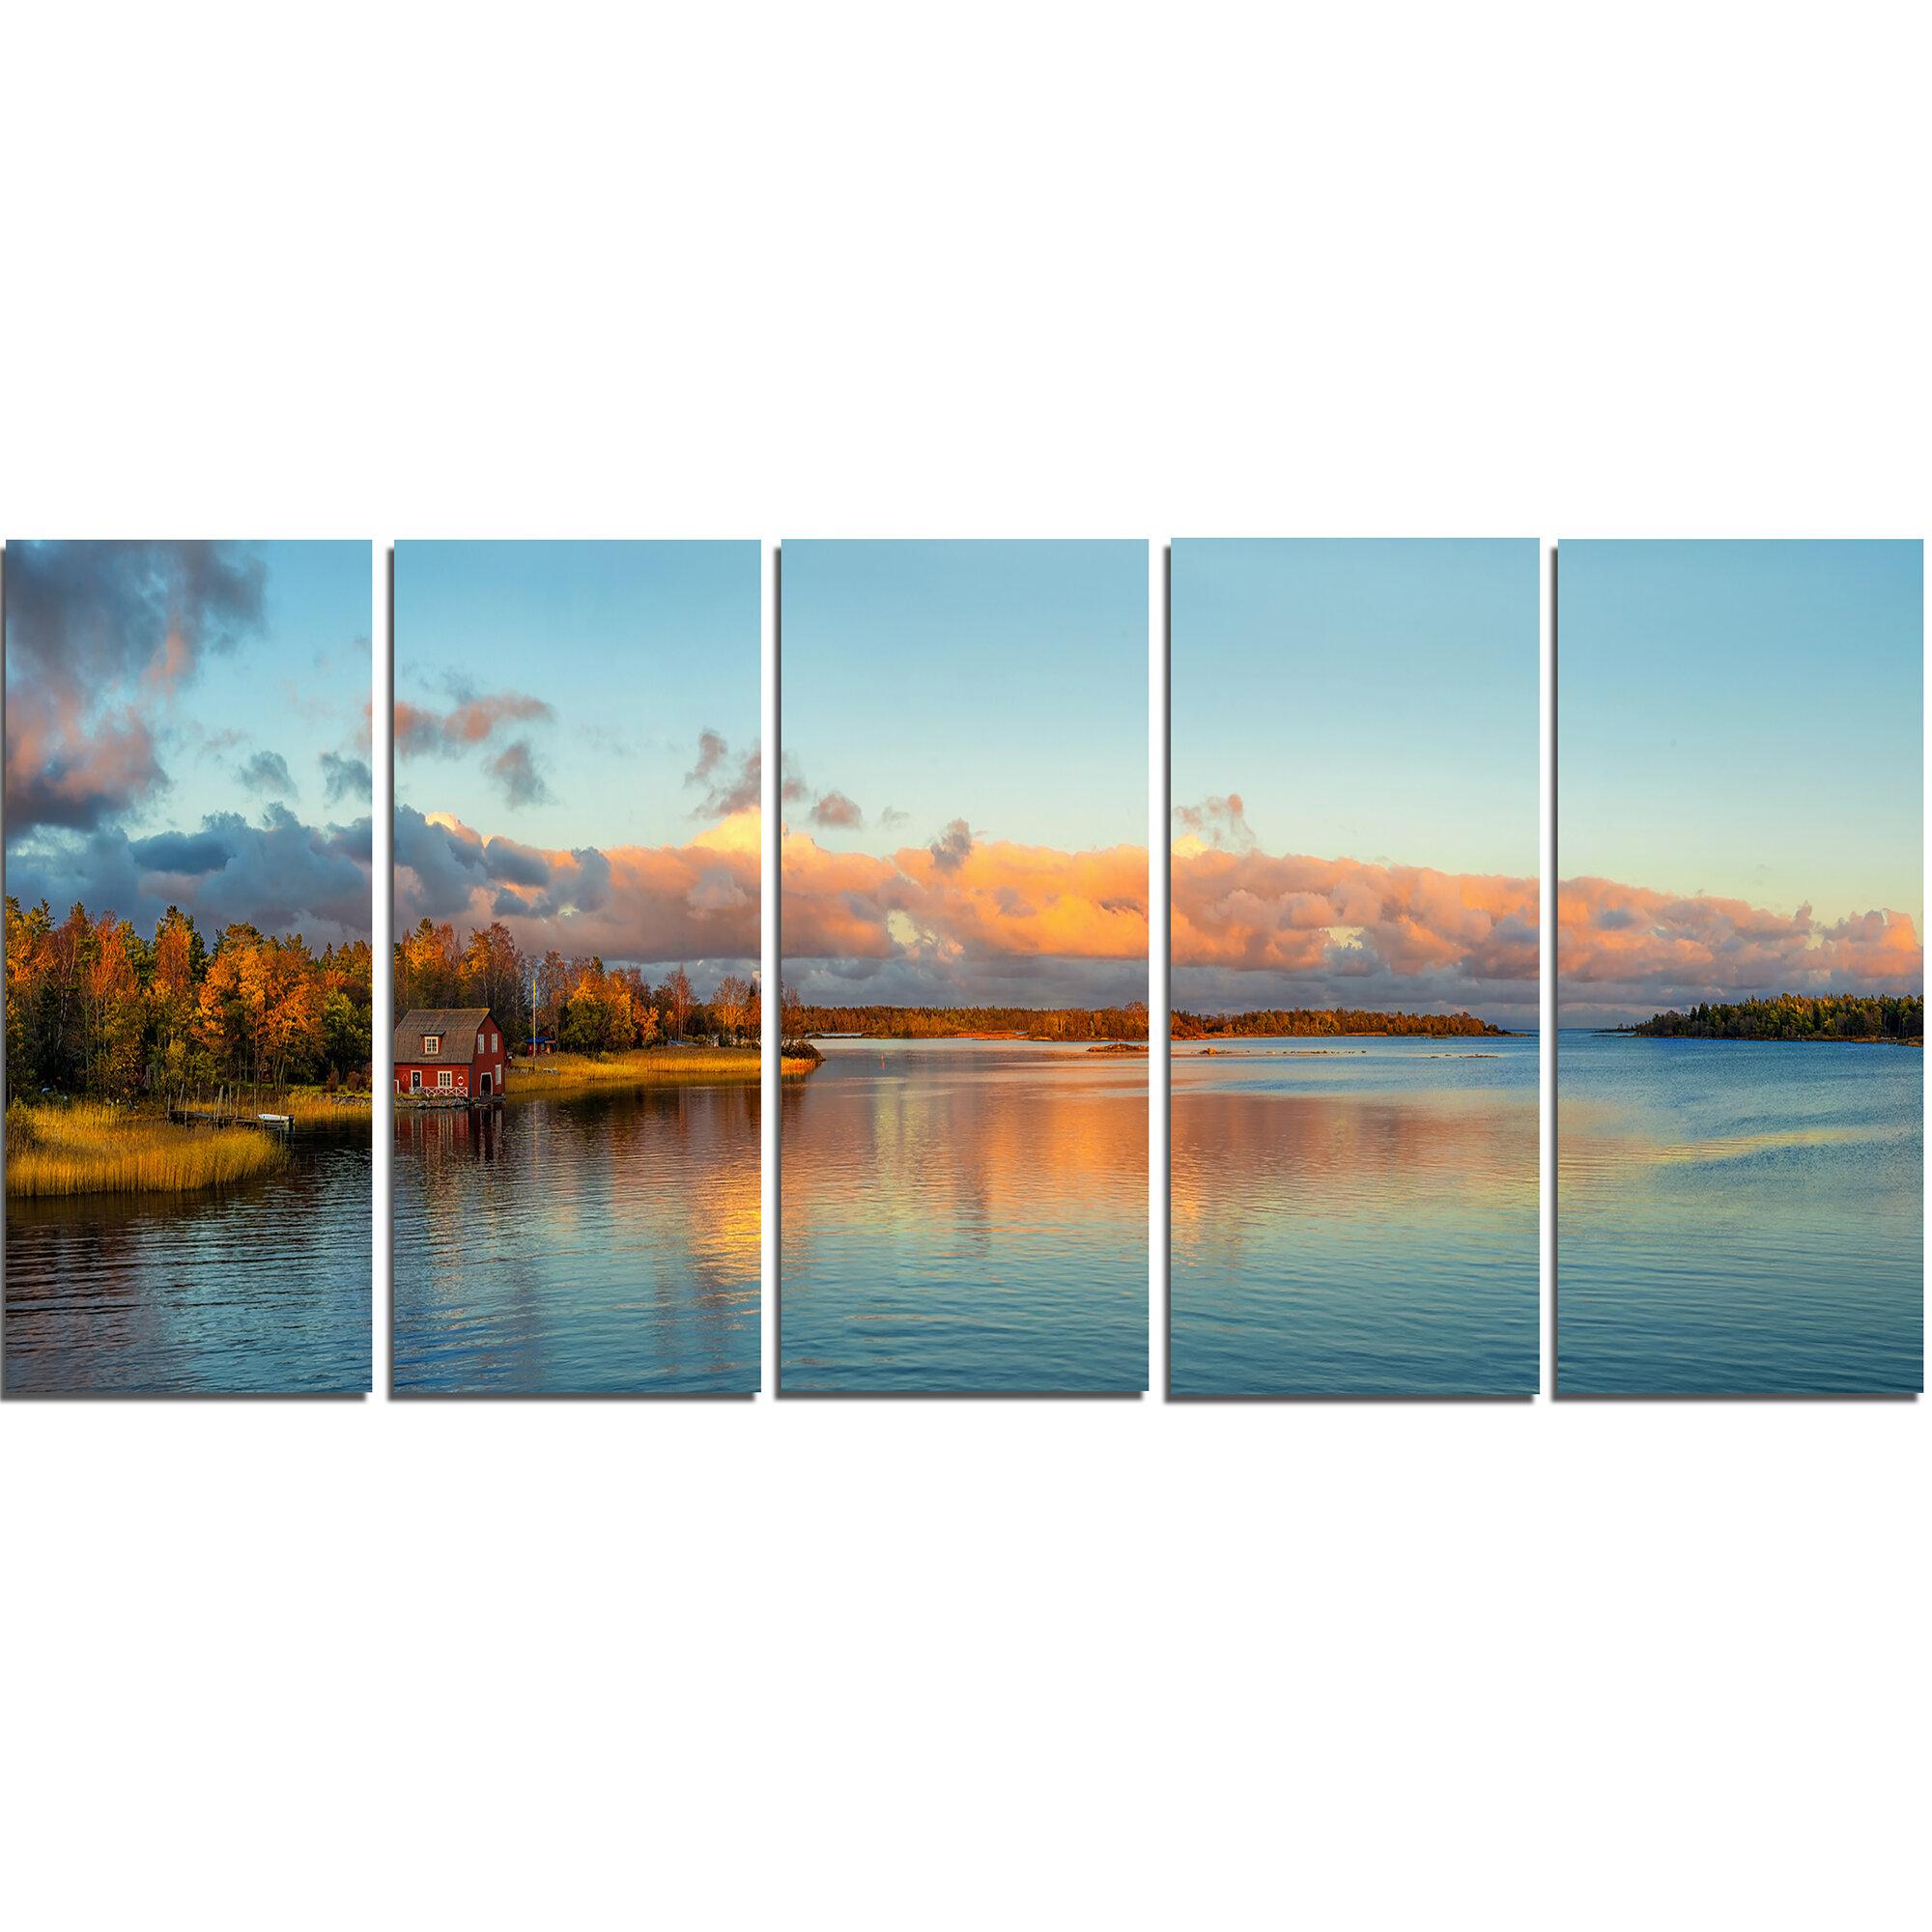 Designart Autumn Sunset Panorama 5 Piece Wall Art On Wrapped Canvas Set Wayfair Ca